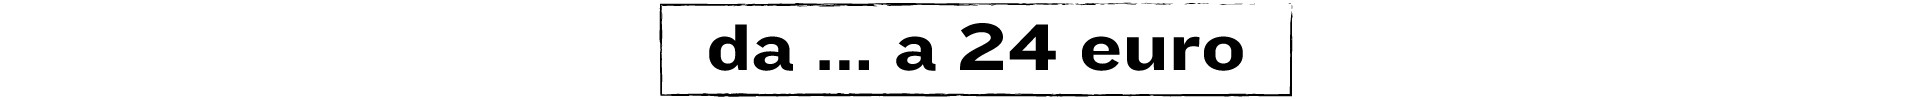 da...a-24-euro.jpg